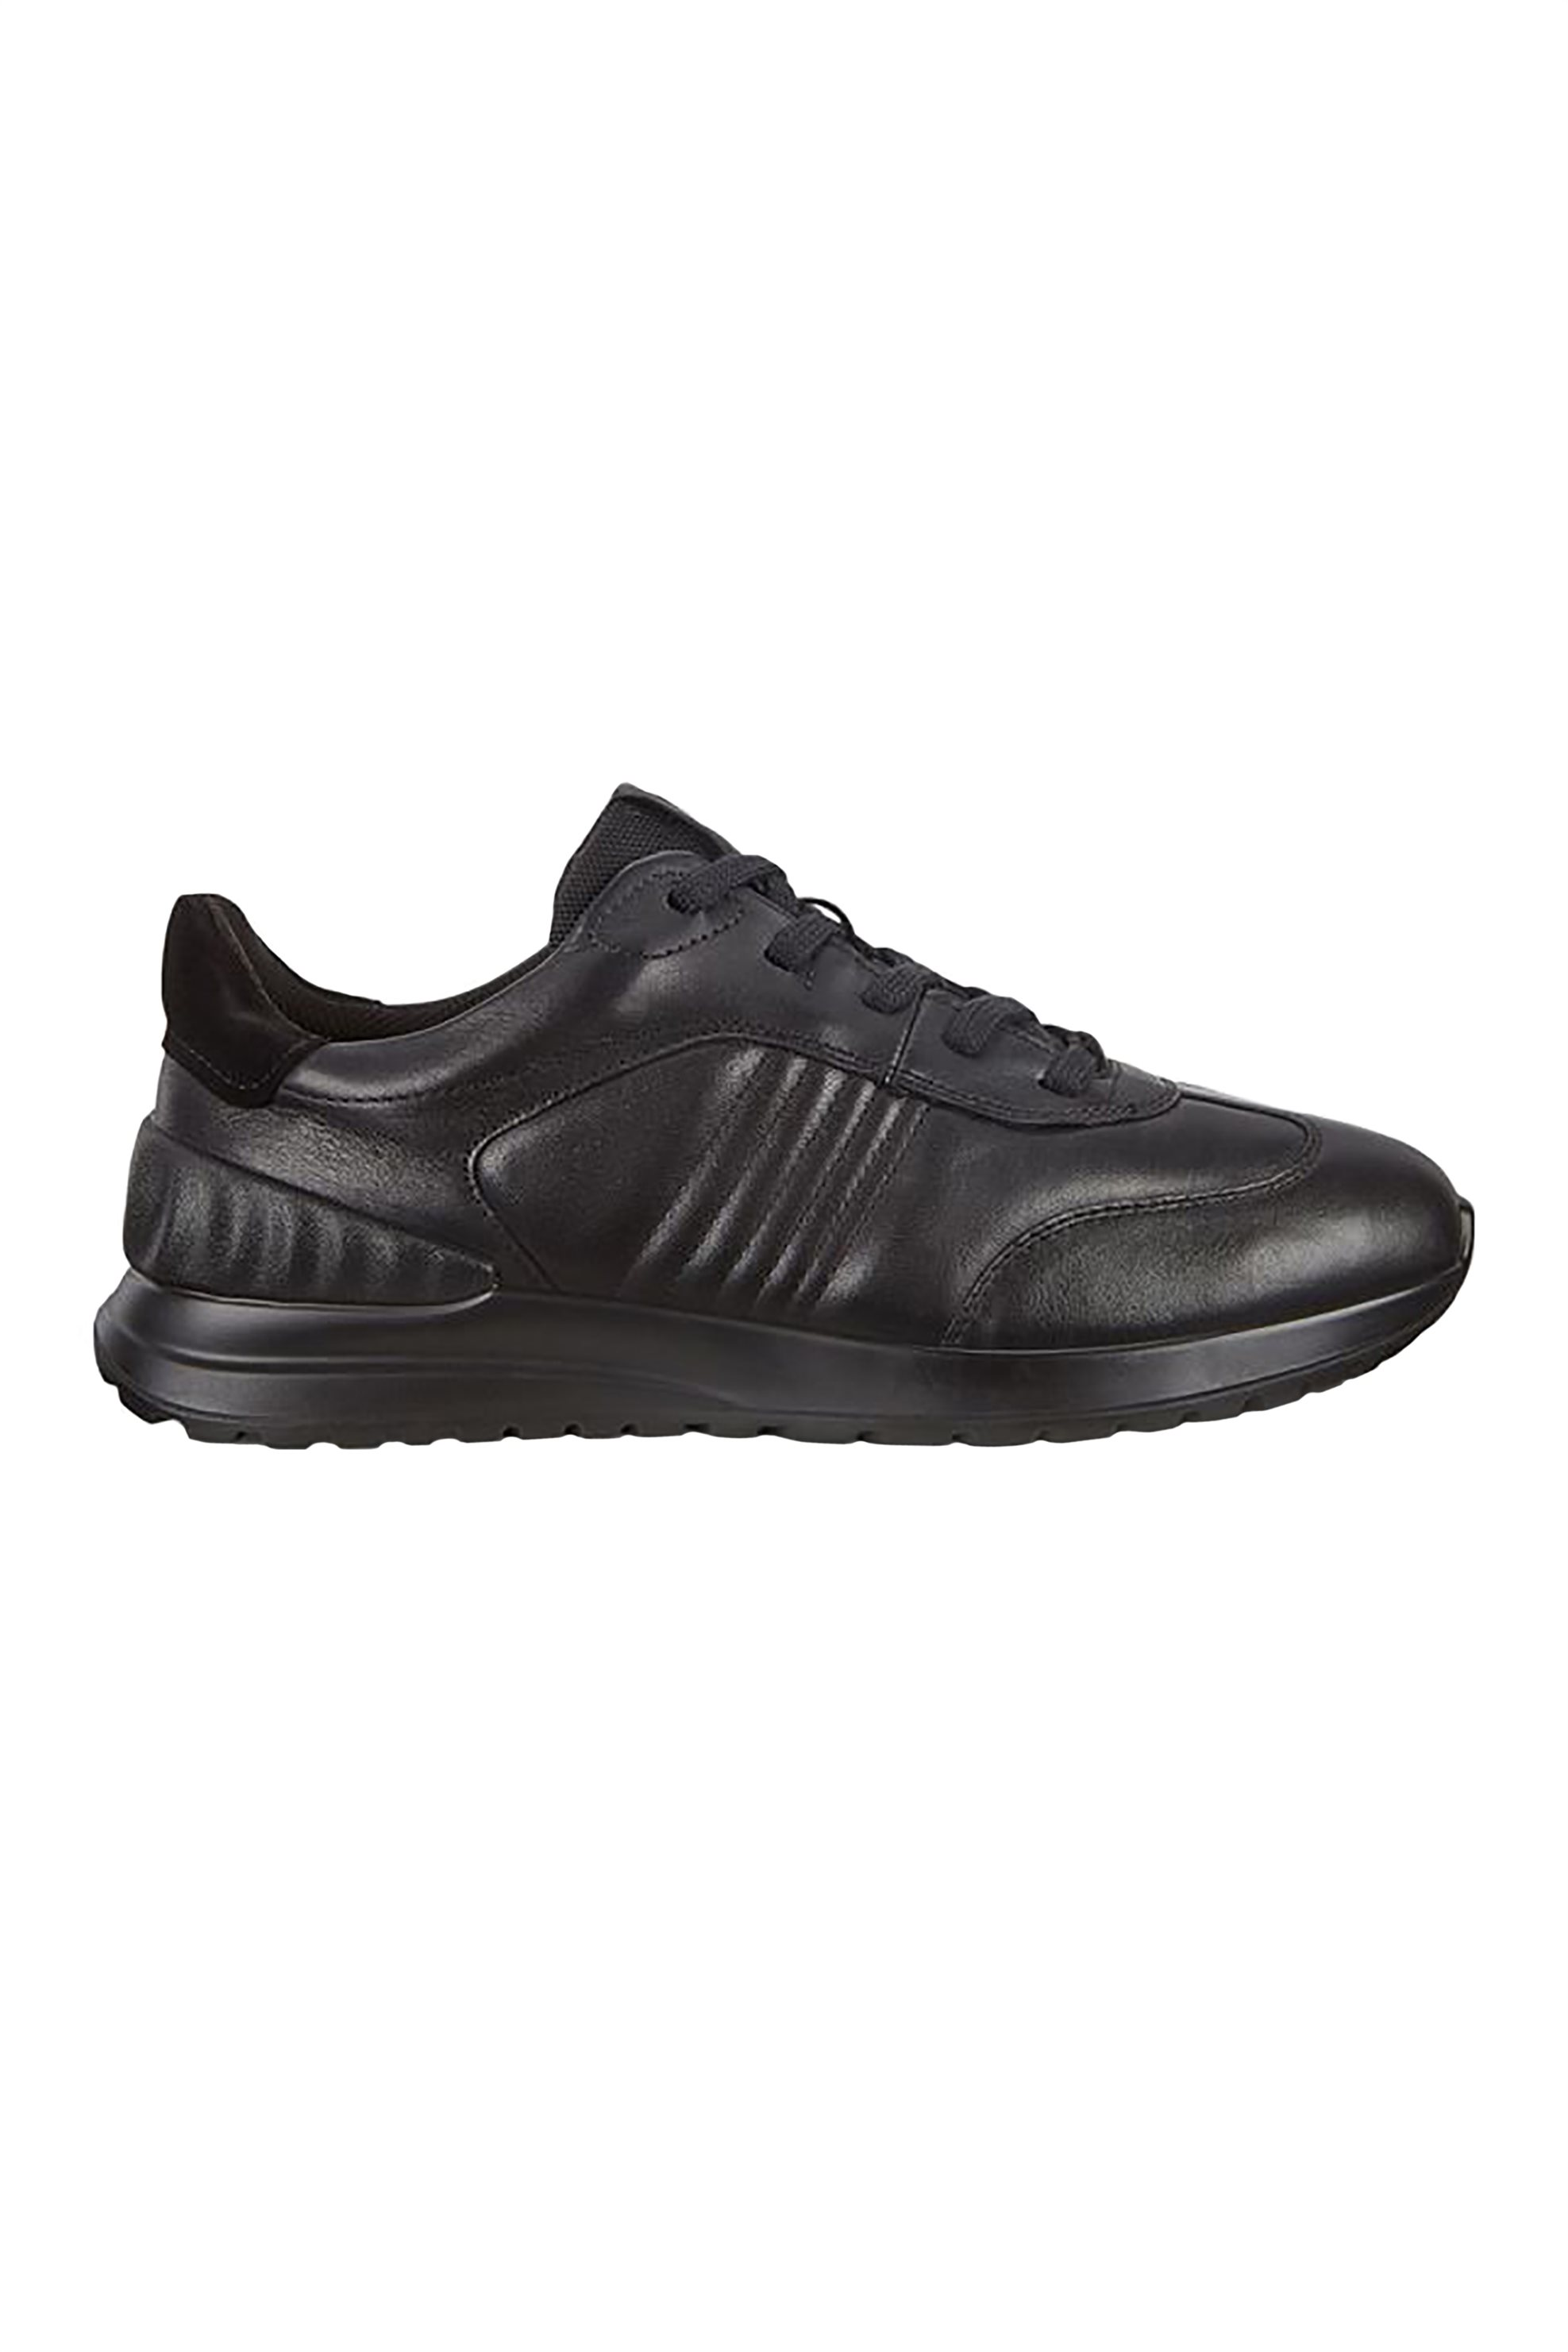 "ECCO ανδρικά sneakers με κορδόνια ""Astir Lite"" – 989-503704 51052 – Μαύρο"